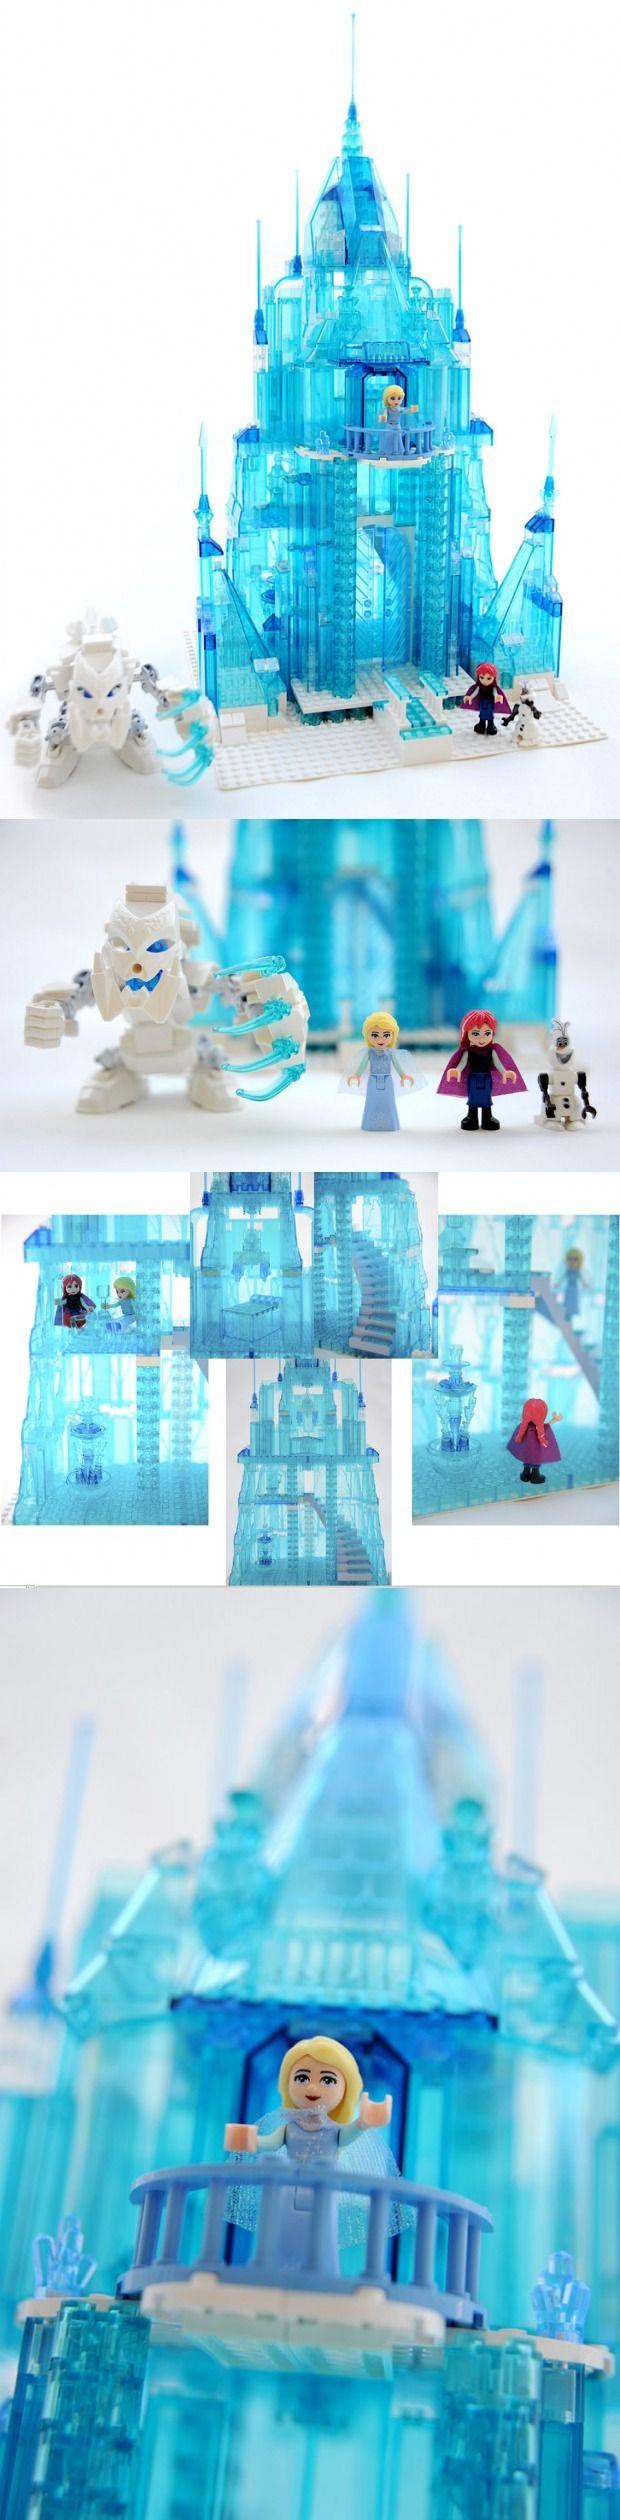 93 Best Legos Images On Pinterest Lego Projects Creations Hard Drive Circuit Board Desk Clock Livbit Frozen Elsas Ice Palace